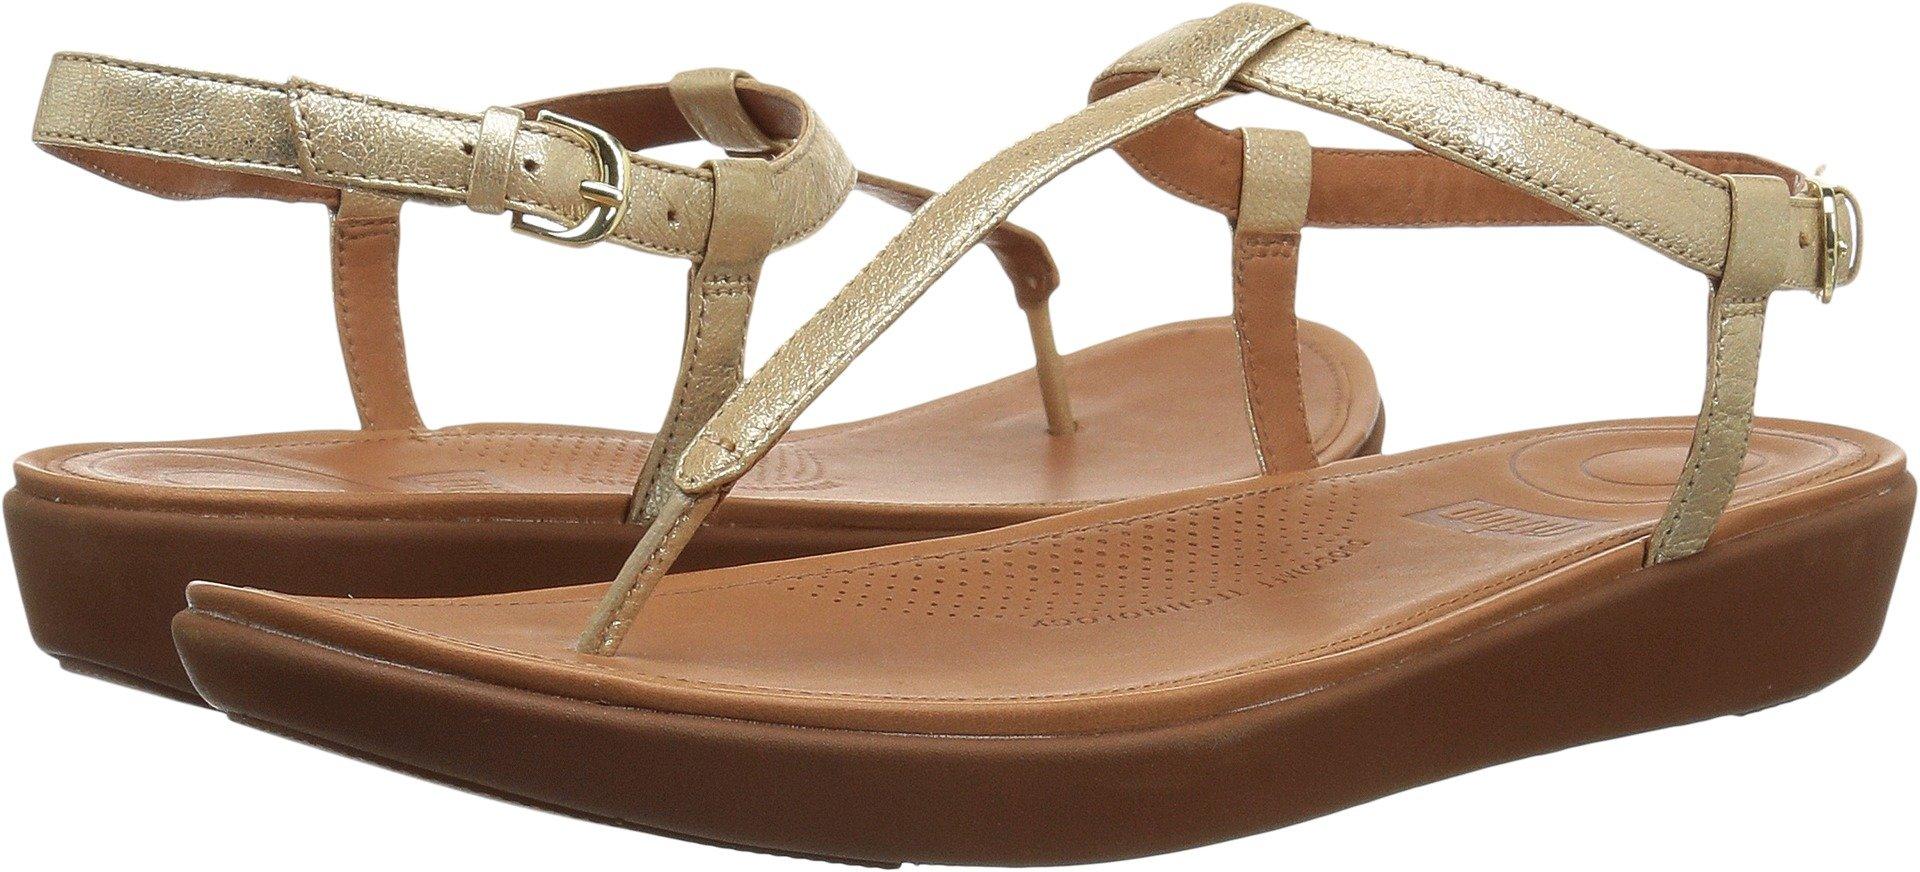 FitFlop Women's Tia Toe-Thong Flat Sandal, Pale Gold, 8 M US